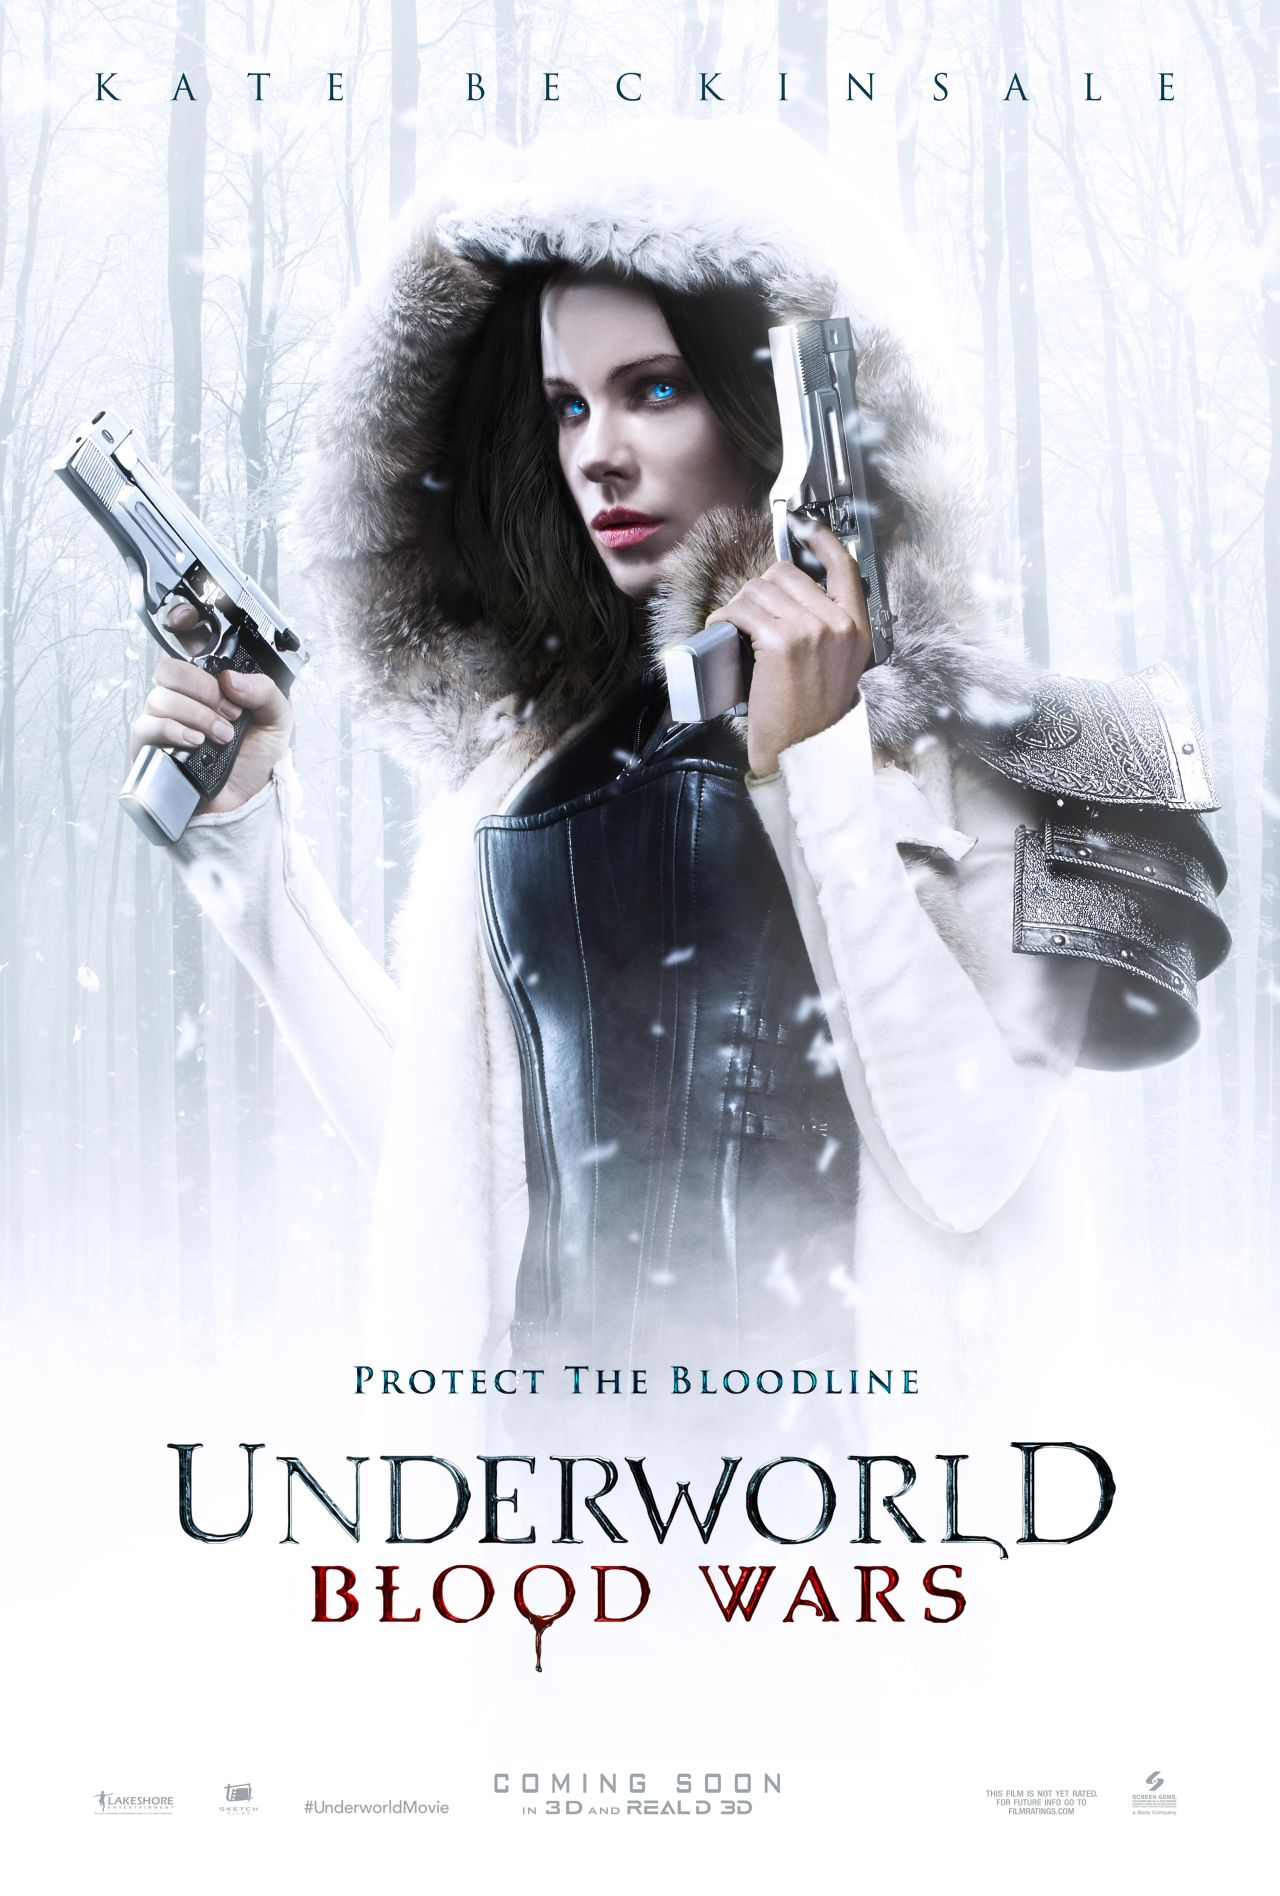 underworld_blood_wars-3d-charakterposter-6